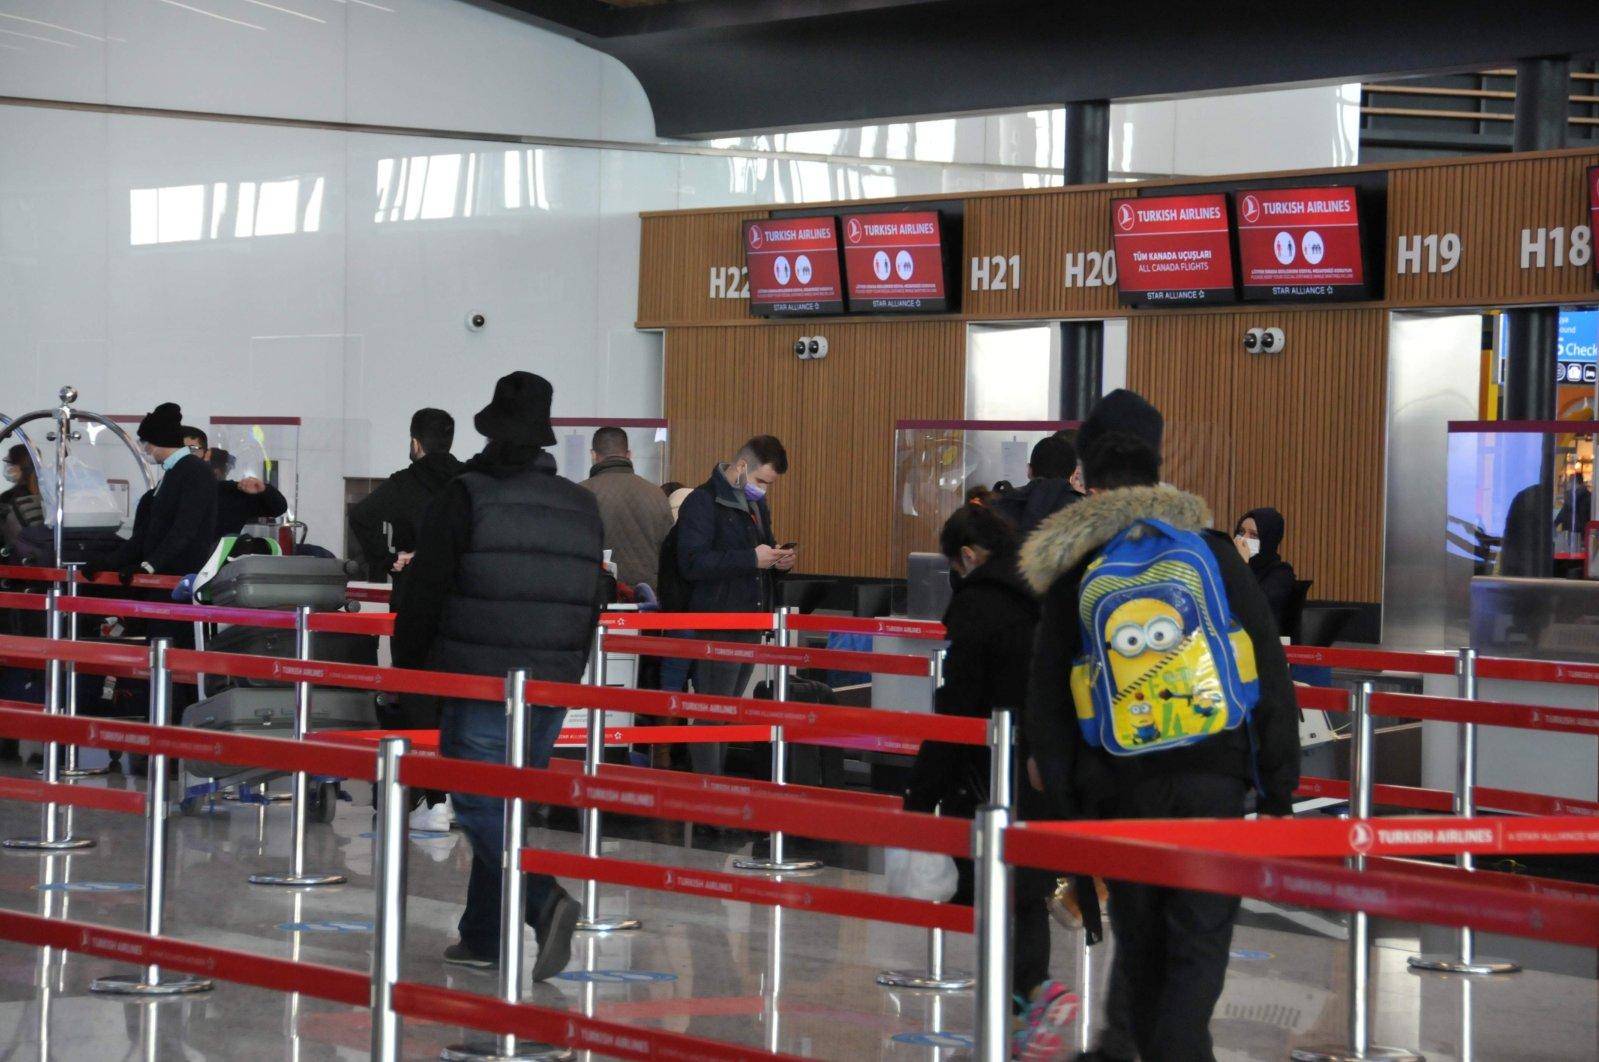 Passengers wait in the flight check-in line, Istanbul, Turkey, Dec. 25, 2020. (IHA Photo)